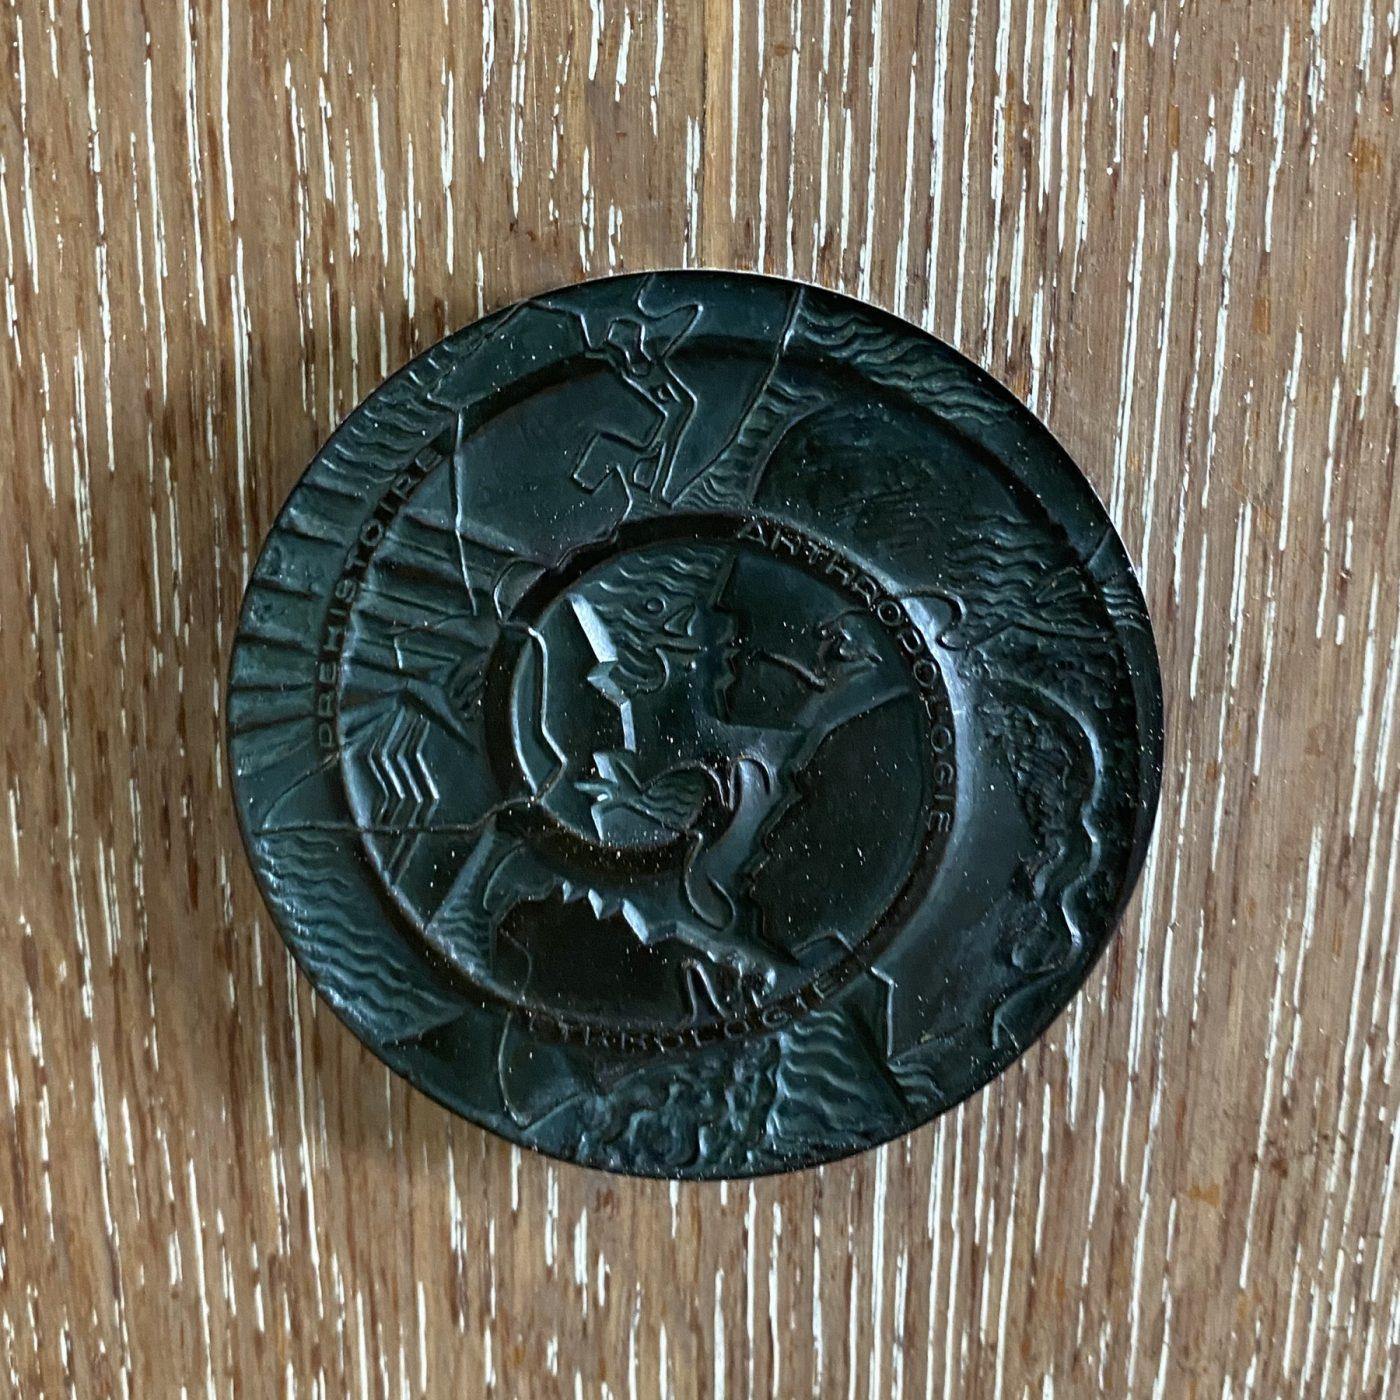 objet-vagabond-oak-sideboard0009